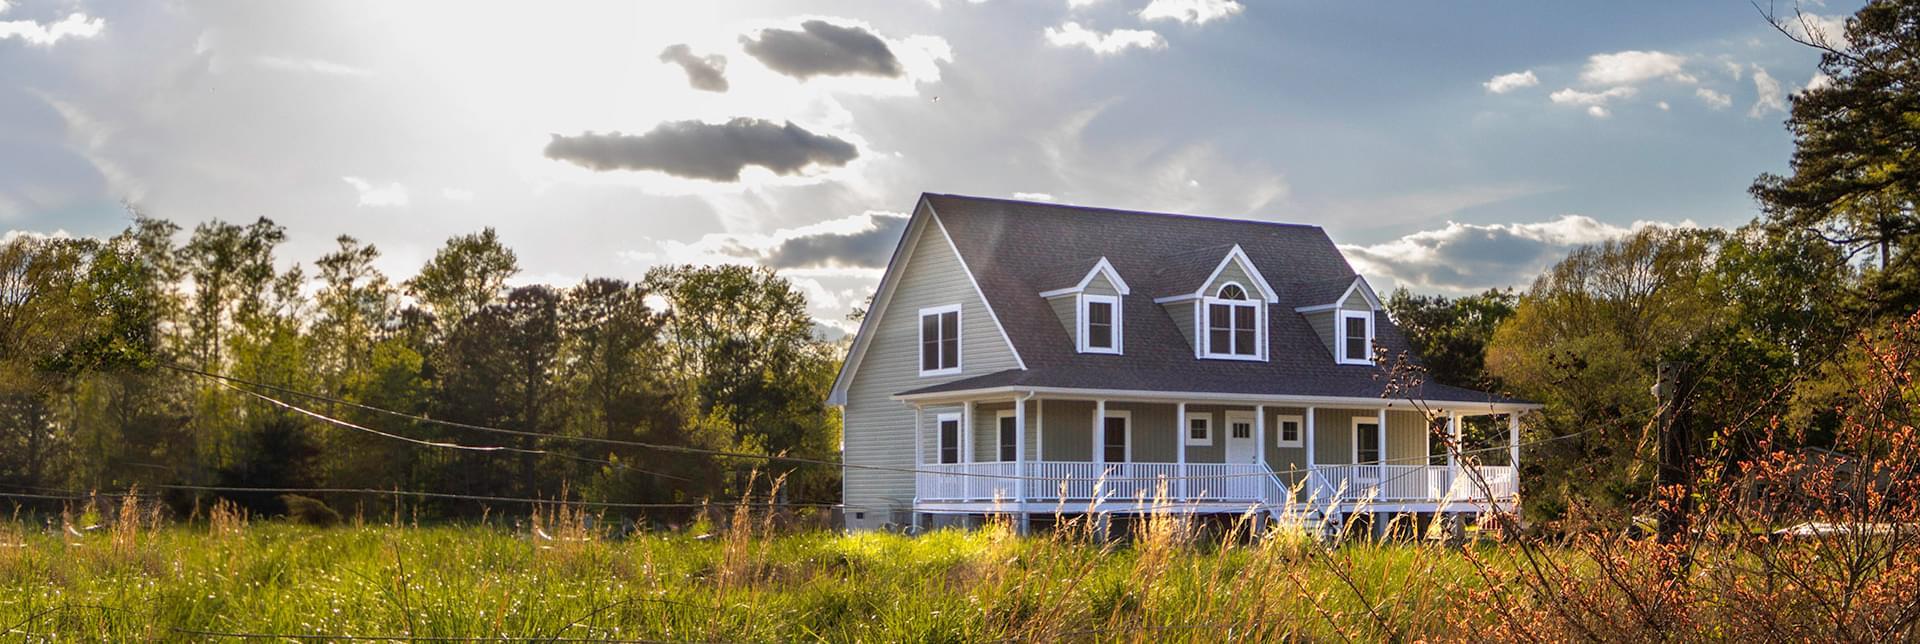 New Homes in Lancaster County VA